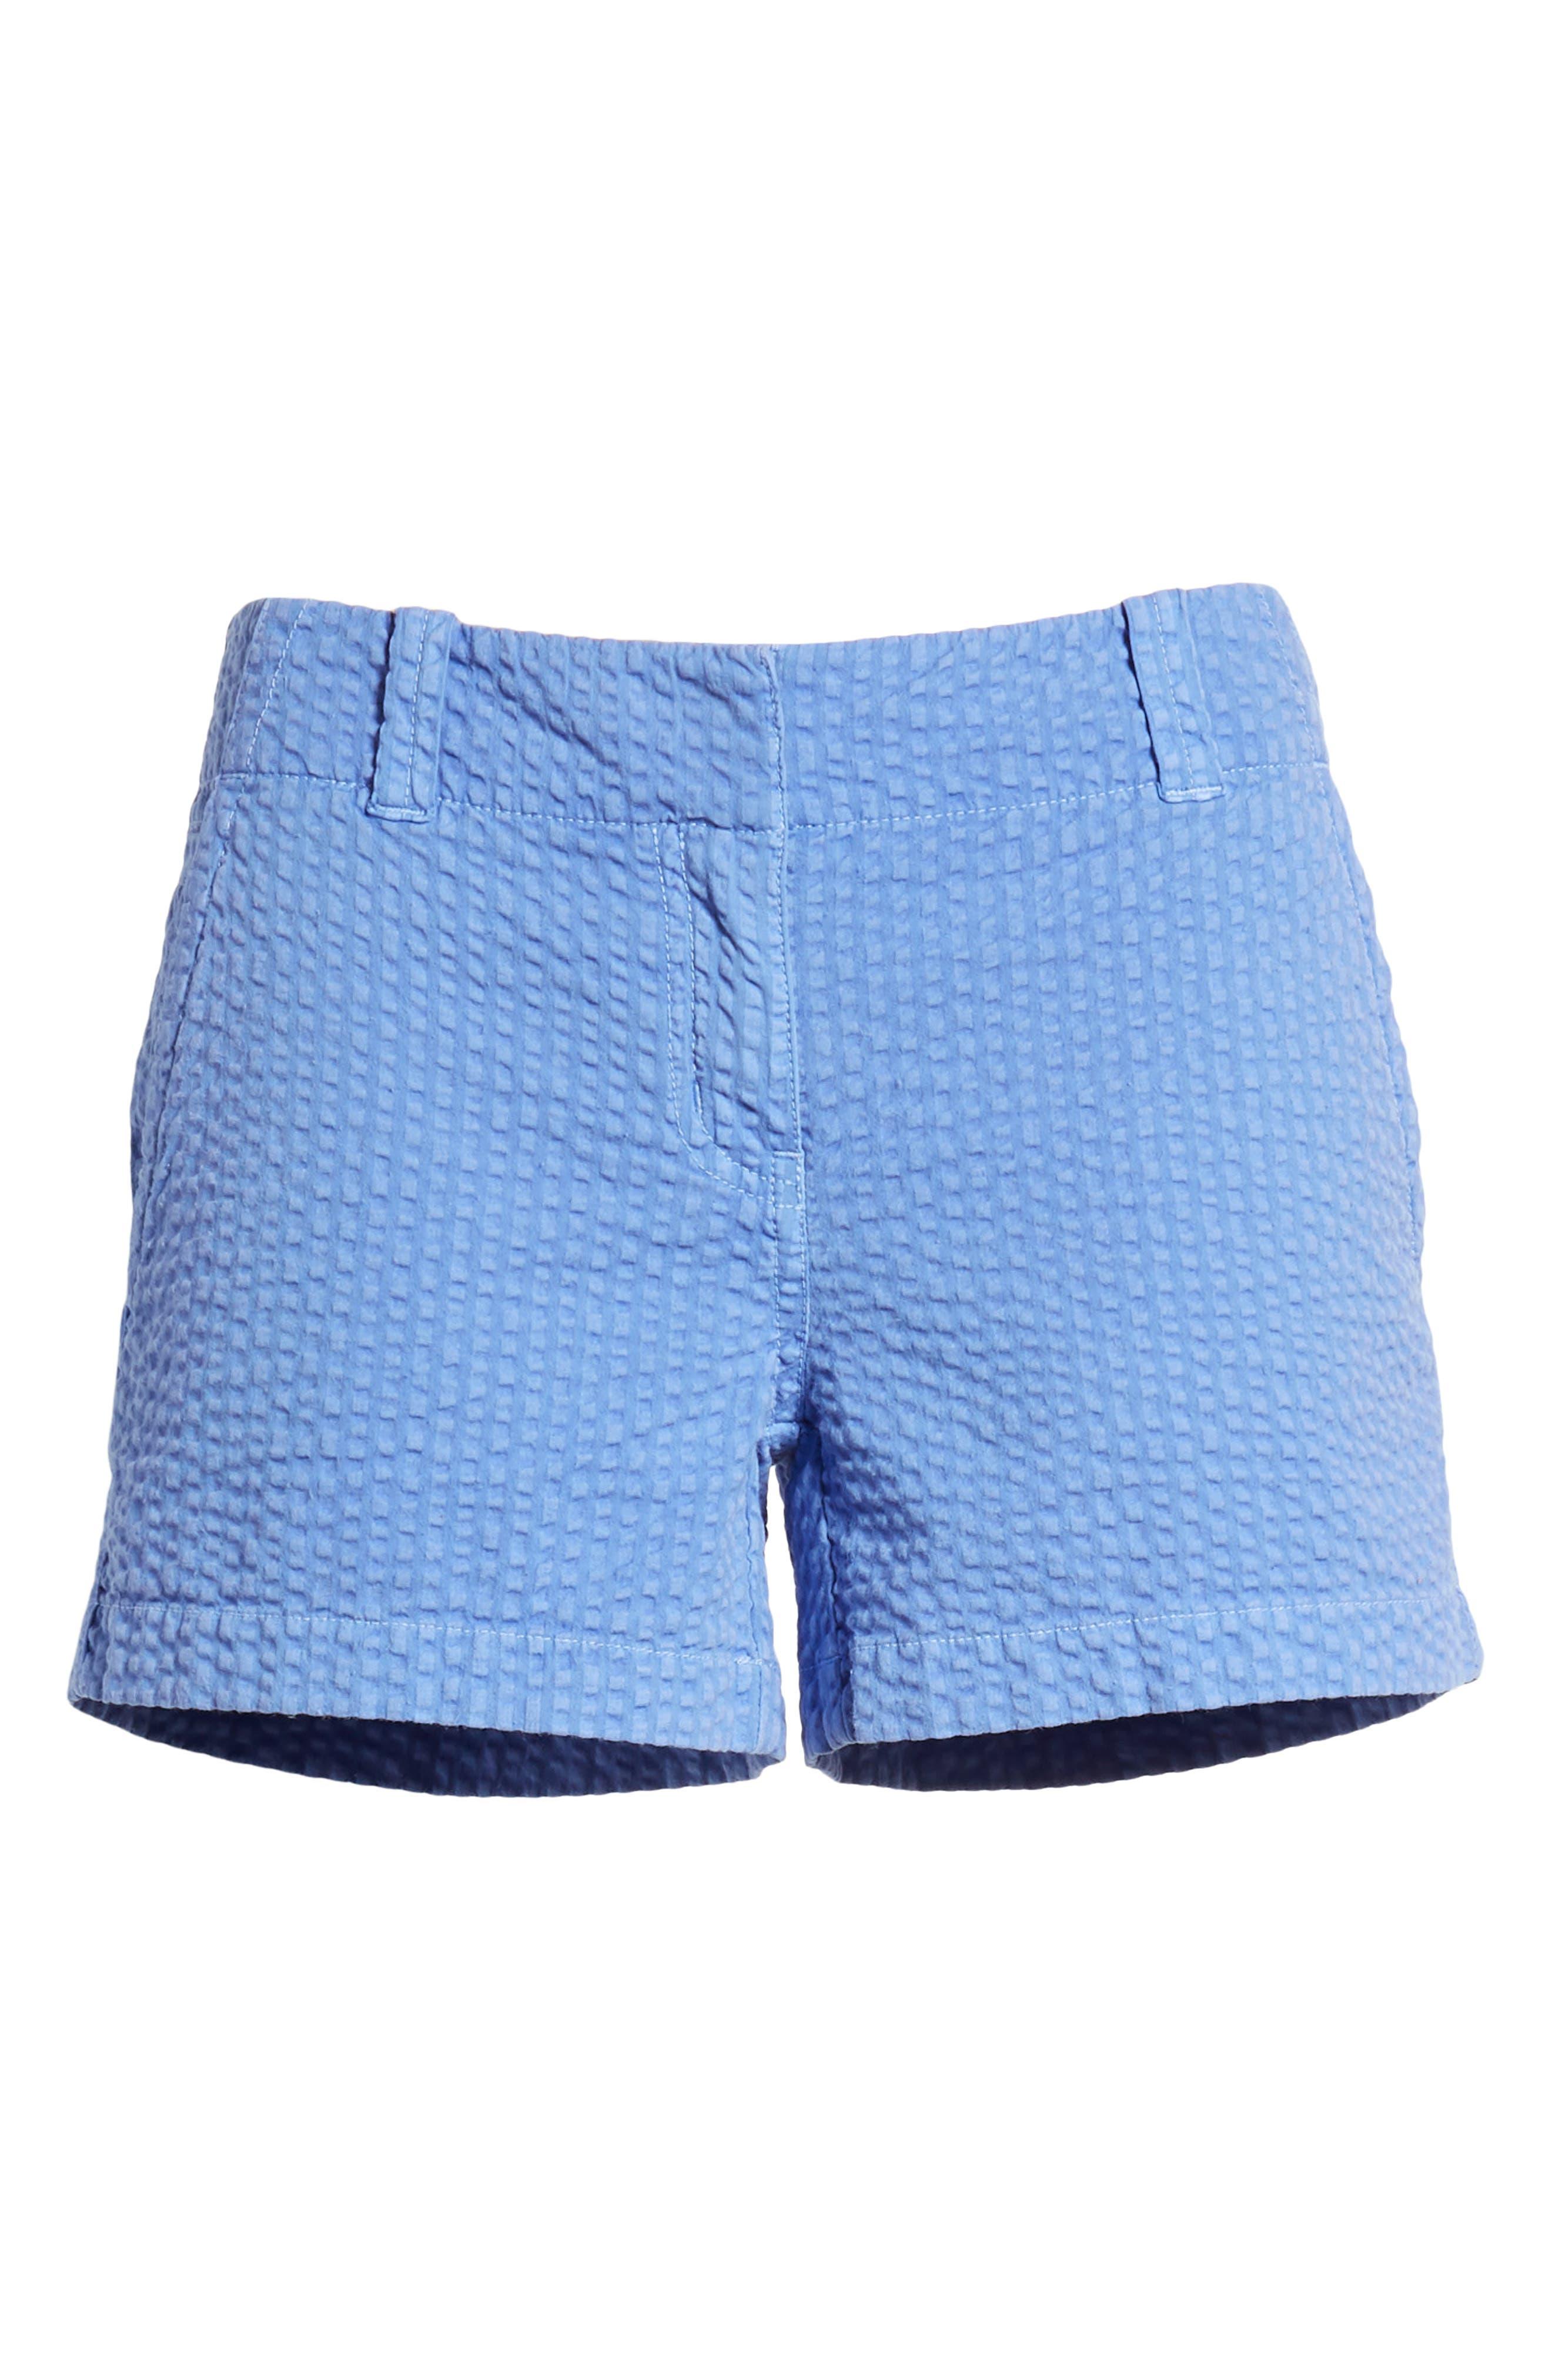 Everyday Seersucker Shorts,                             Alternate thumbnail 6, color,                             411